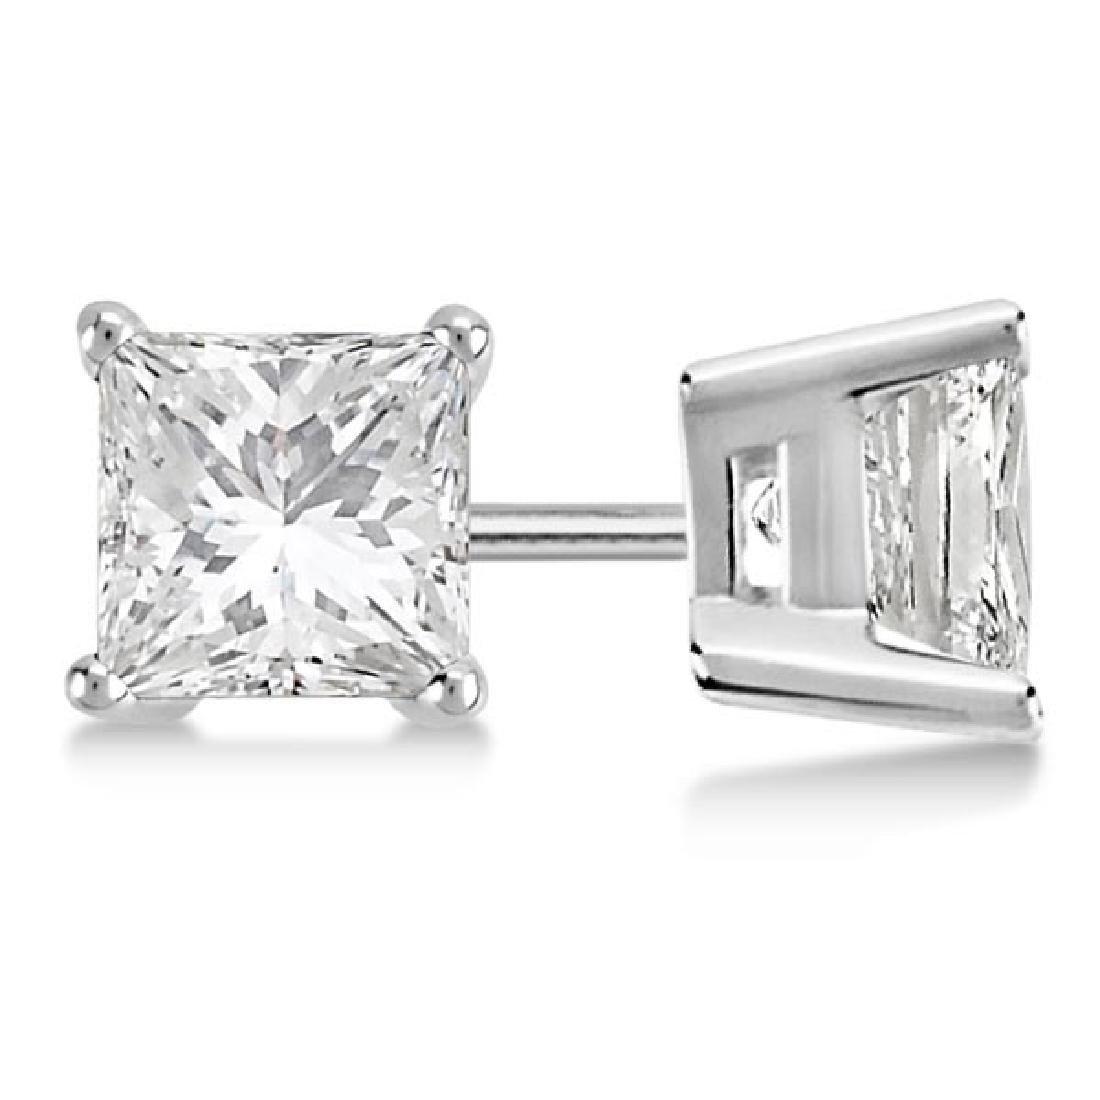 Certified 1.05 CTW Princess Diamond Stud Earrings E/SI3